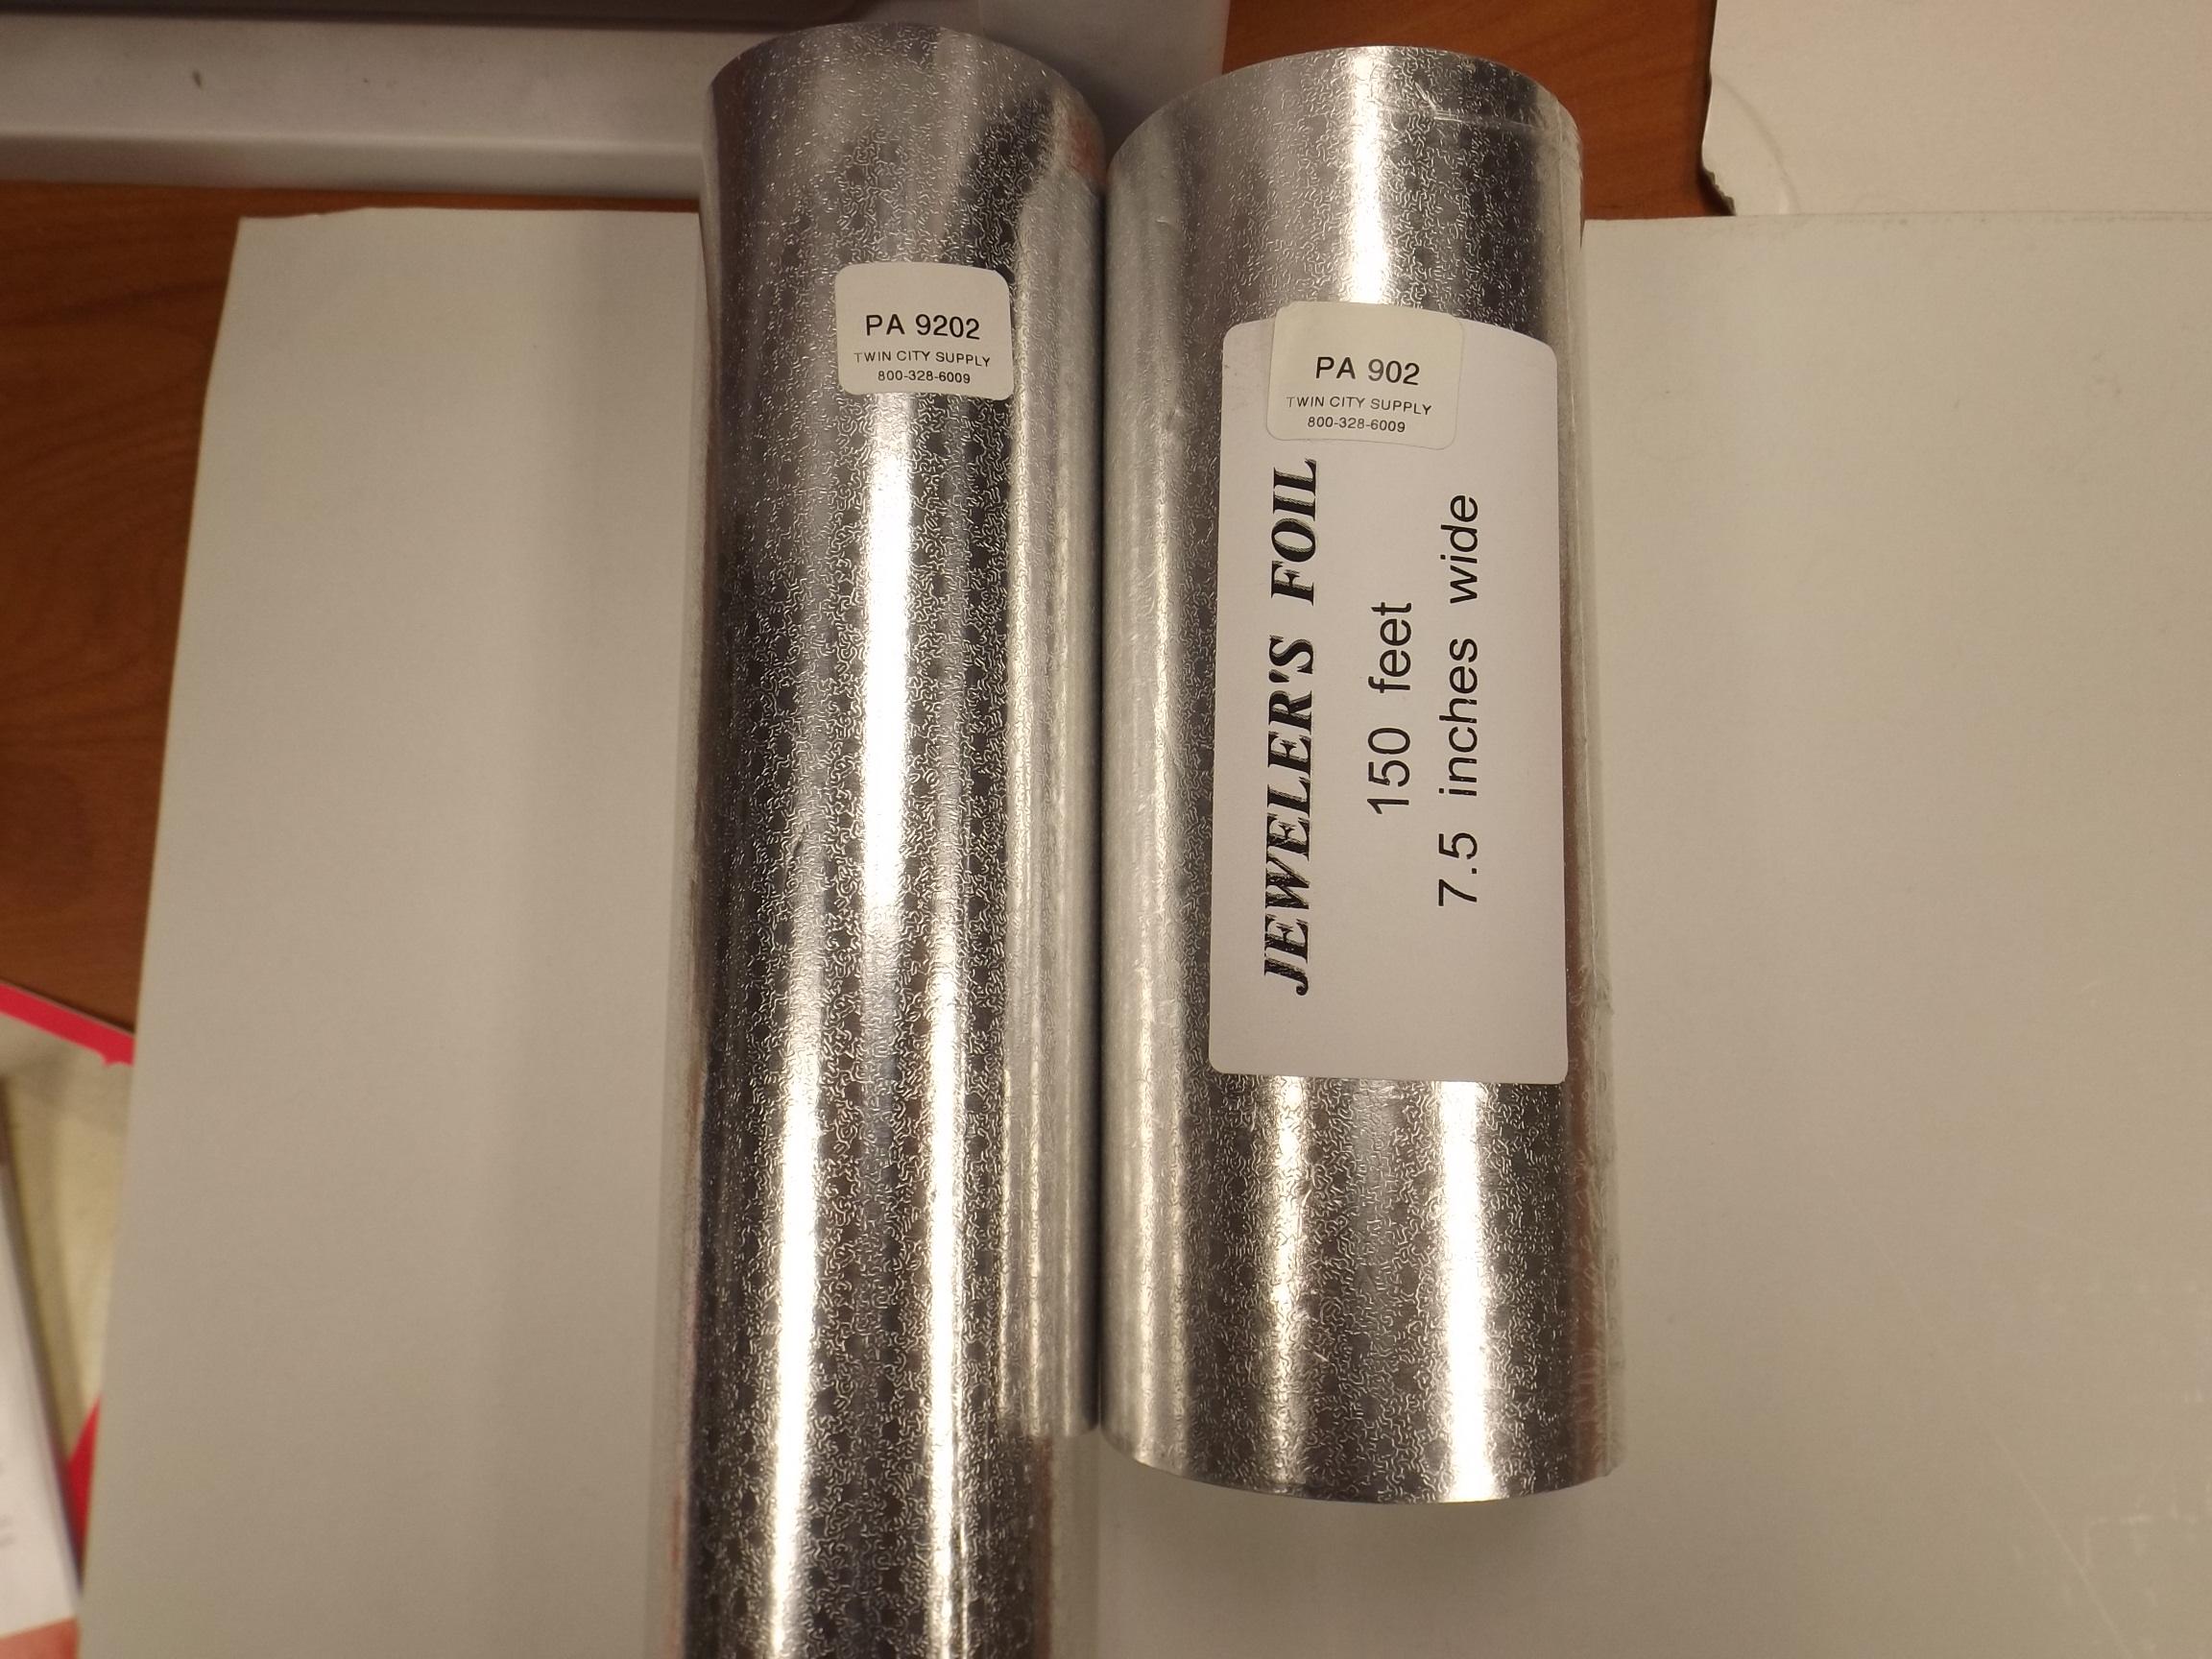 "PA902 Silver Nugget Foil Jewelers Roll 7 1/2"" x 150 feet"